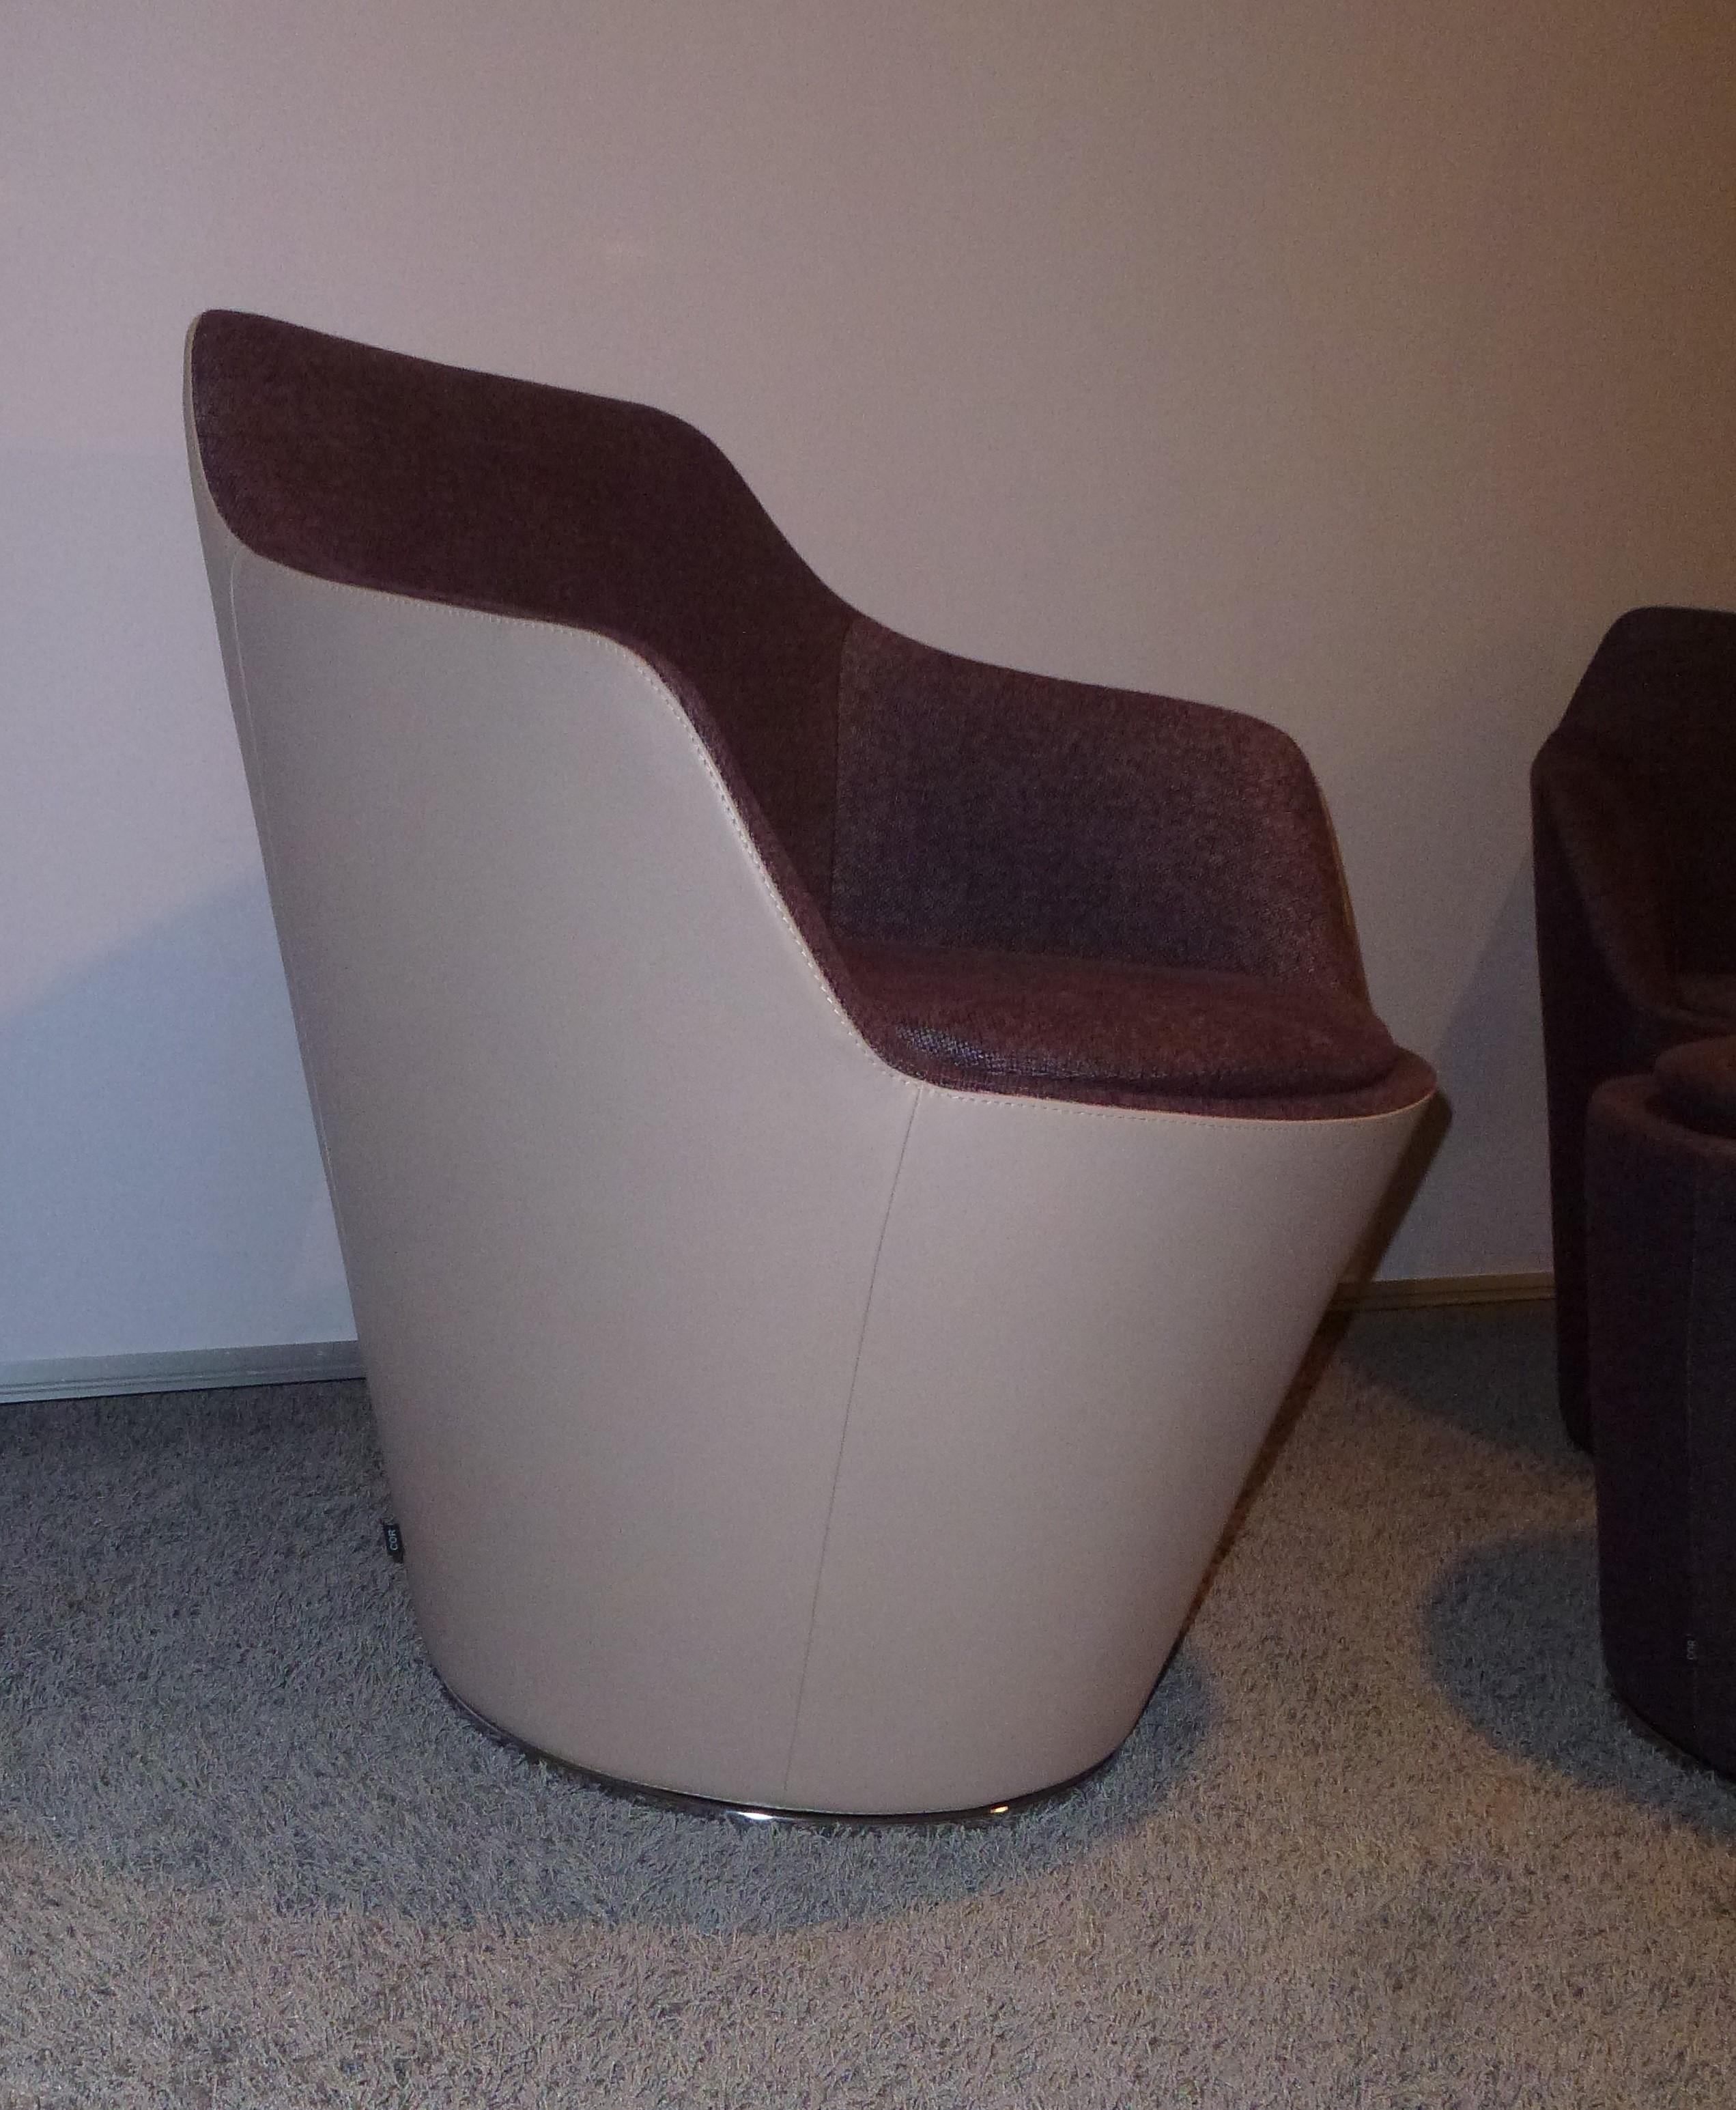 Möbel Braum Cor FLINT Sessel